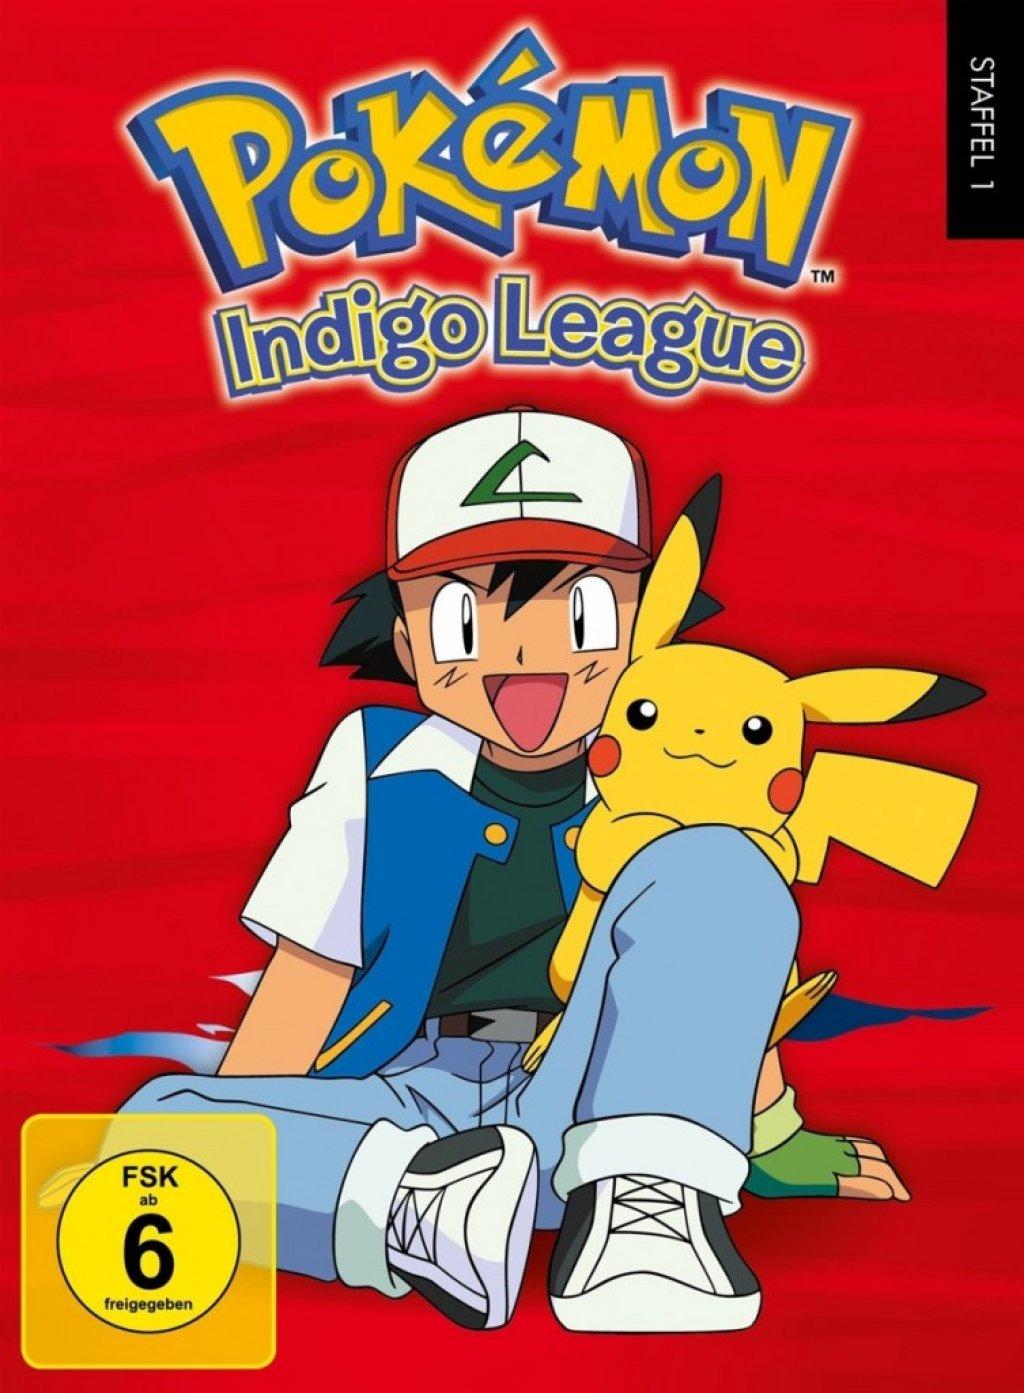 Pokémon - Staffel 01 / Indigo Liga (DVD)